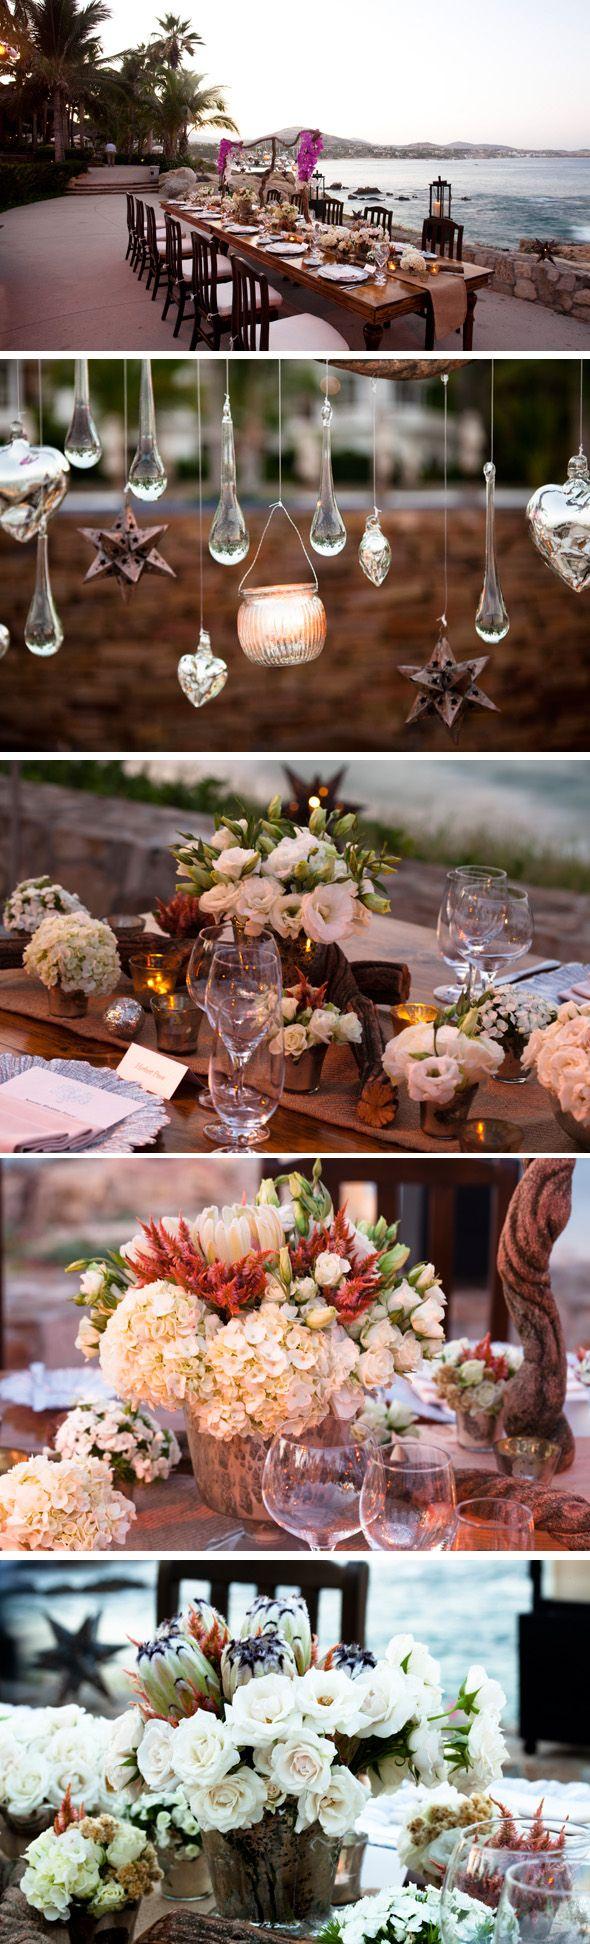 wedding table by Elena Damy Floral Design, mexico